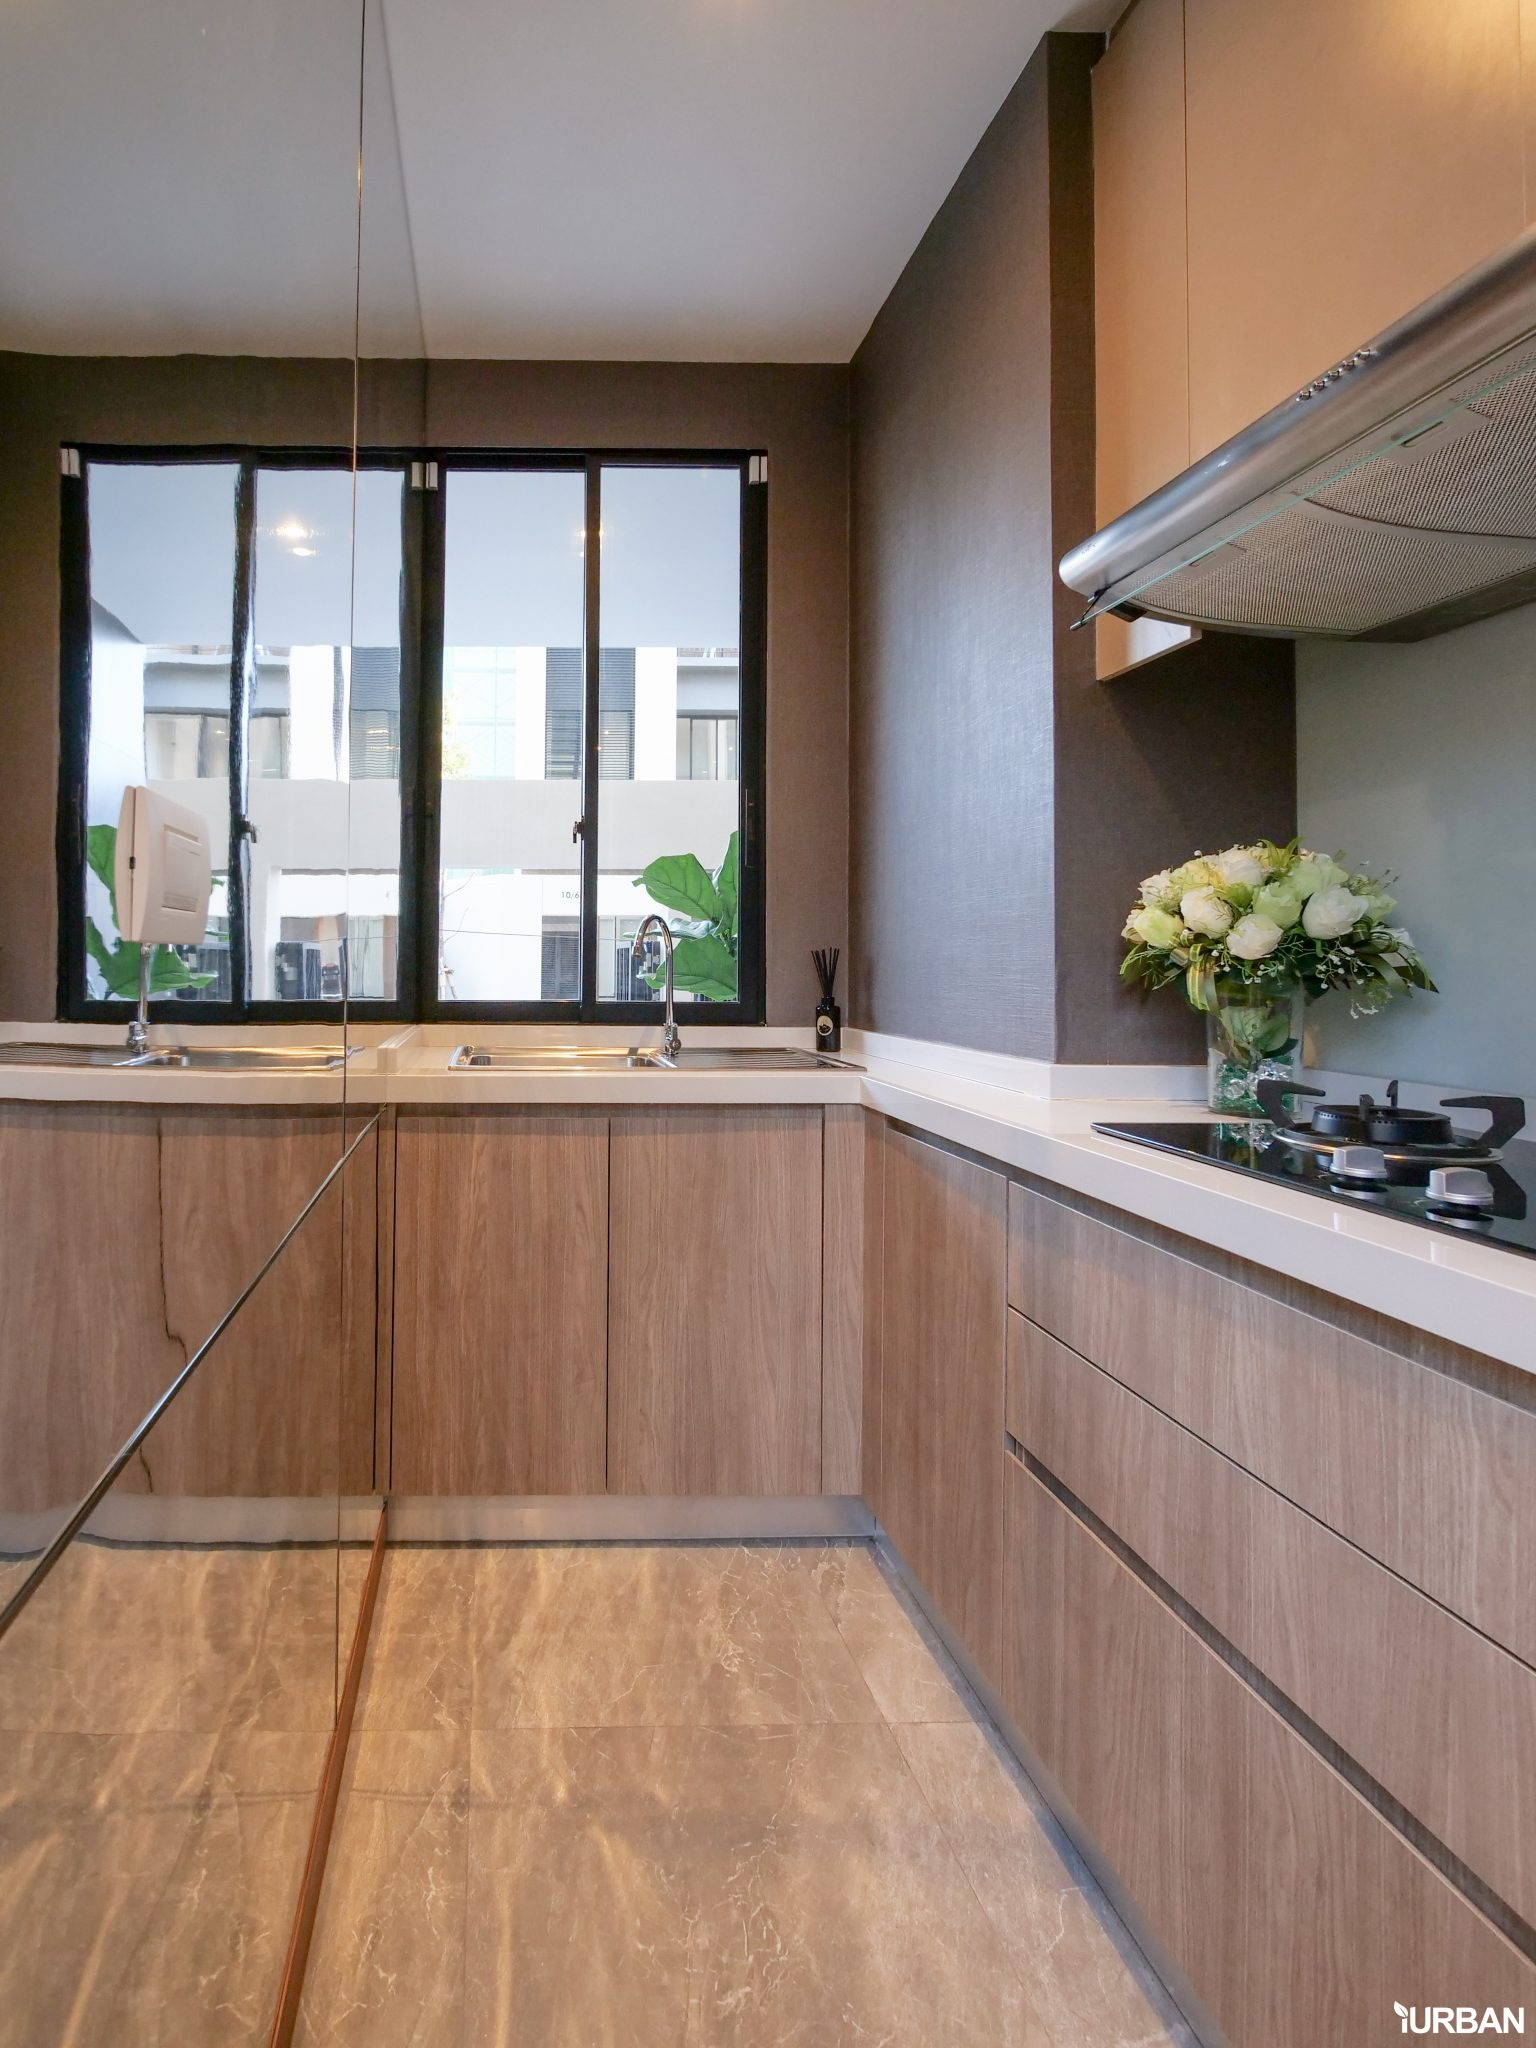 AIRES RAMA9 รีวิว Luxury Townhome 3.5 ชั้น + Rooftop ออกแบบสวย ย่านพระราม9 (ใกล้ รพ.สมิติเวช) 31 - AIRES